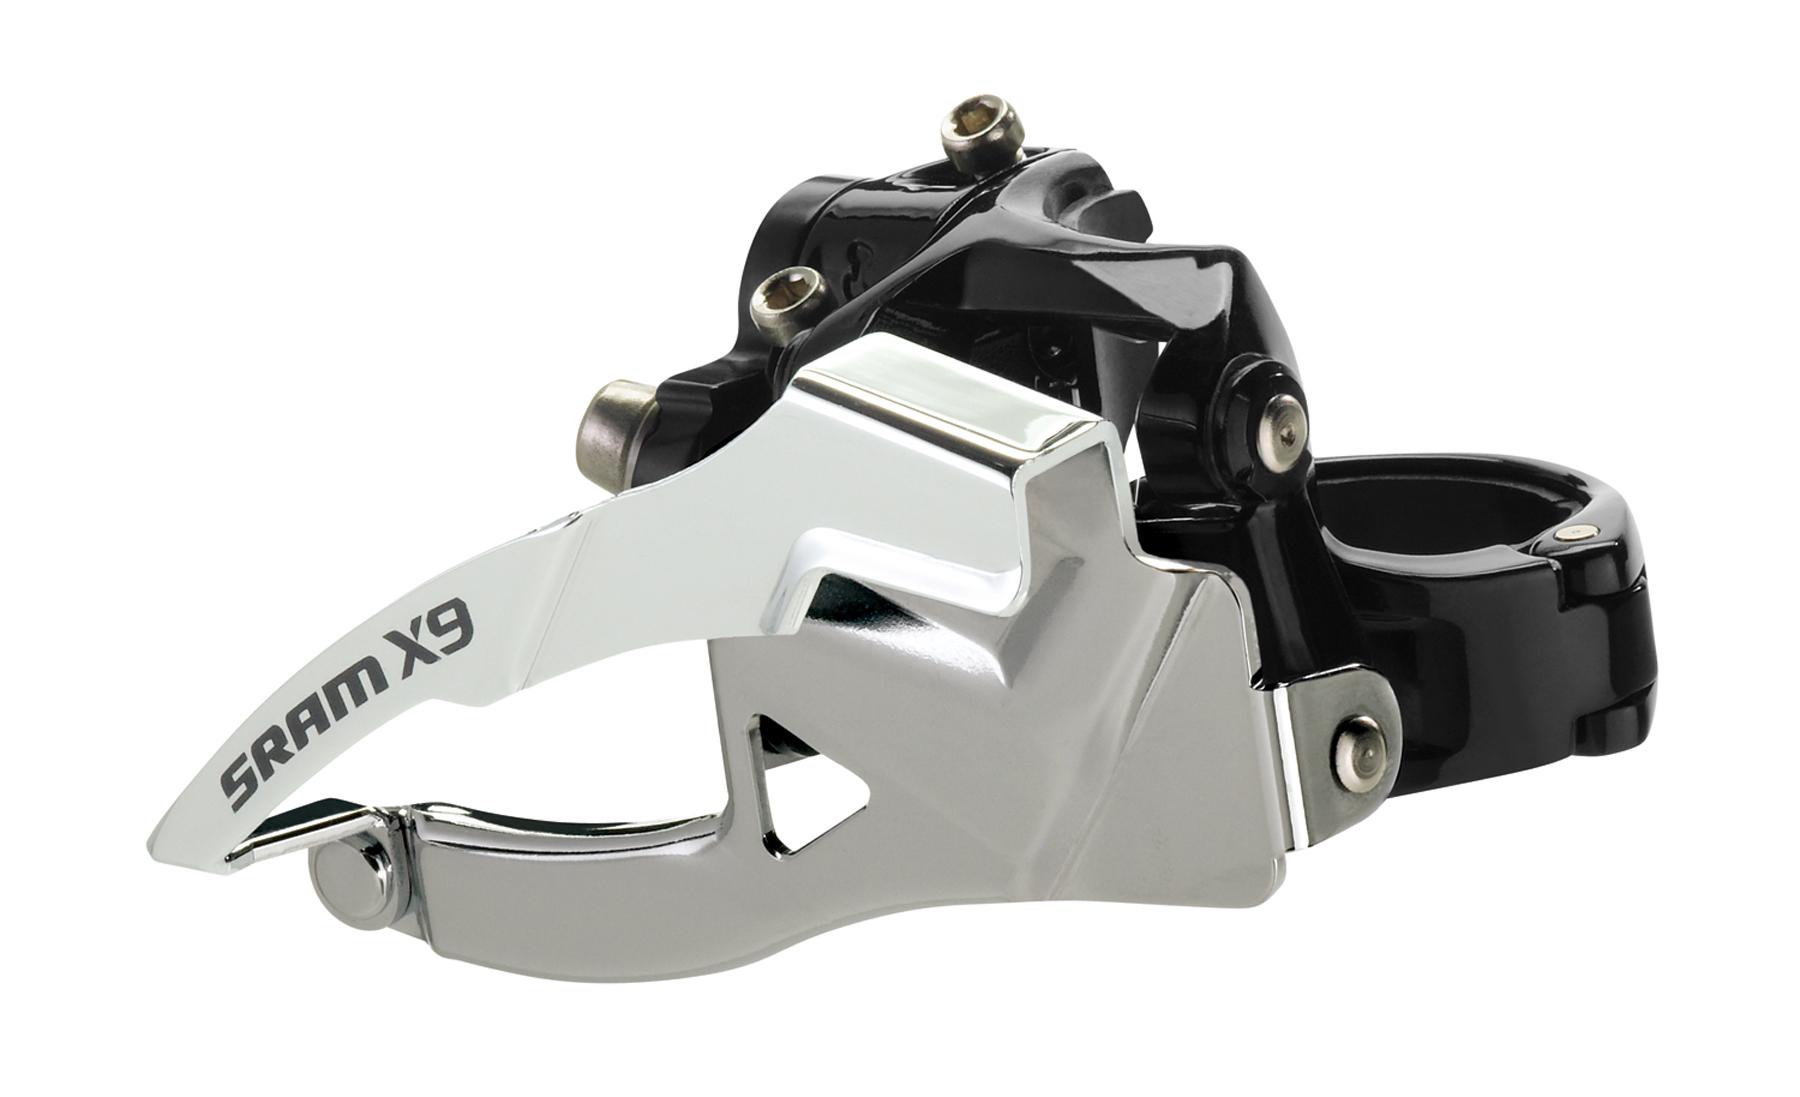 SRAM Front derailleur X9 High clamp Ø34.9 mm 2x10 speed Dual pull | Front derailleur